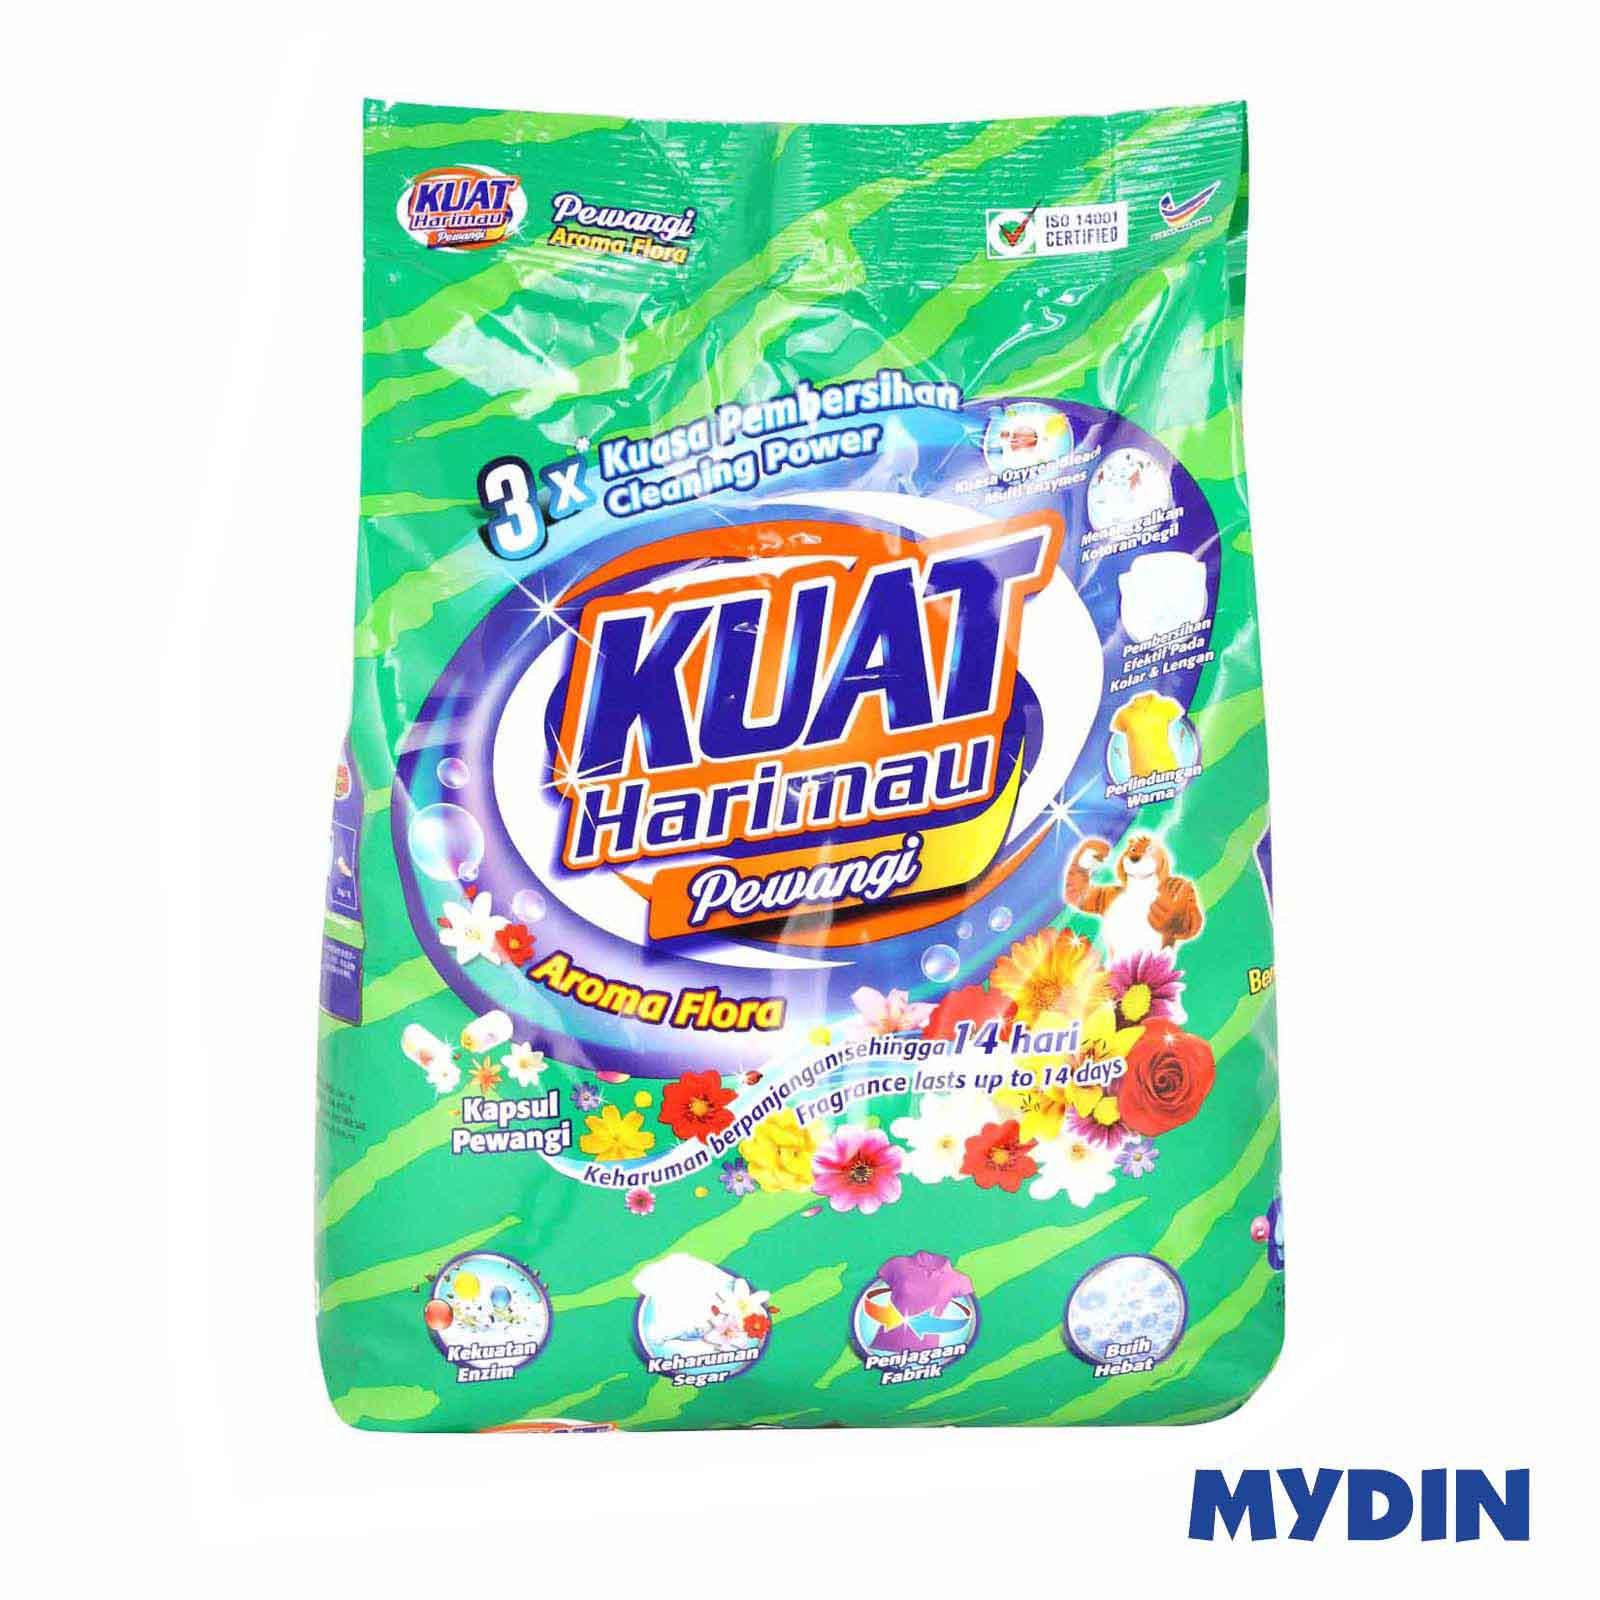 Kuat Harimau Floral Detergent Powder (3.8kg)